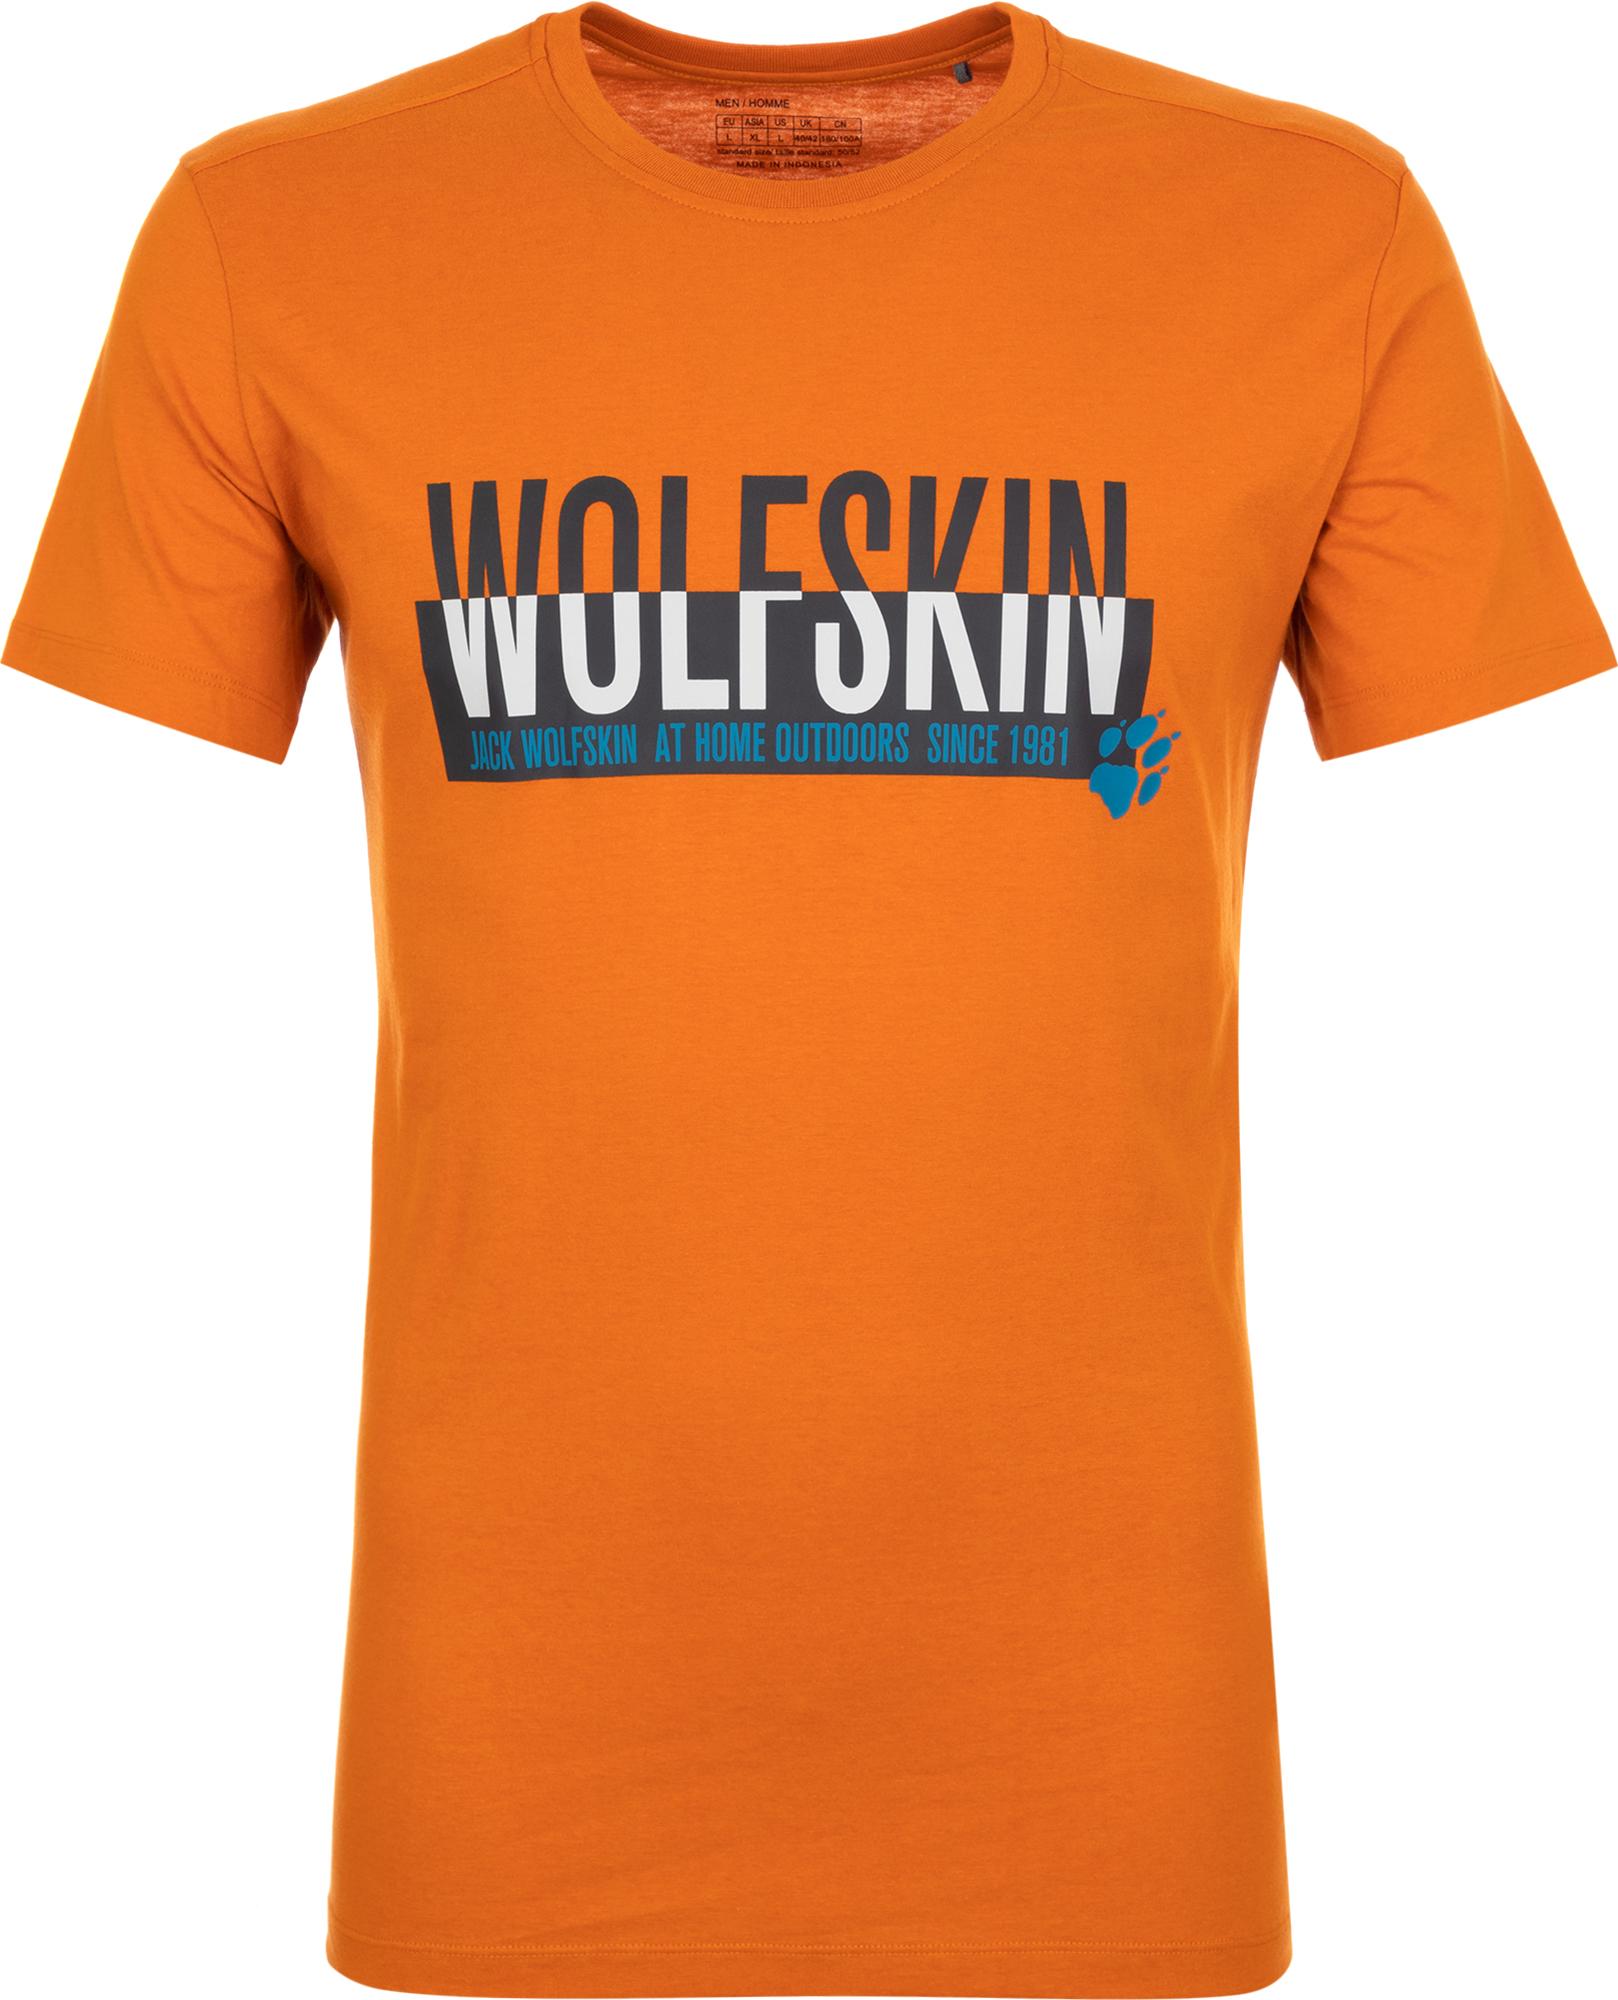 купить JACK WOLFSKIN Футболка мужская JACK WOLFSKIN Slogan, размер 54-56 по цене 1749 рублей